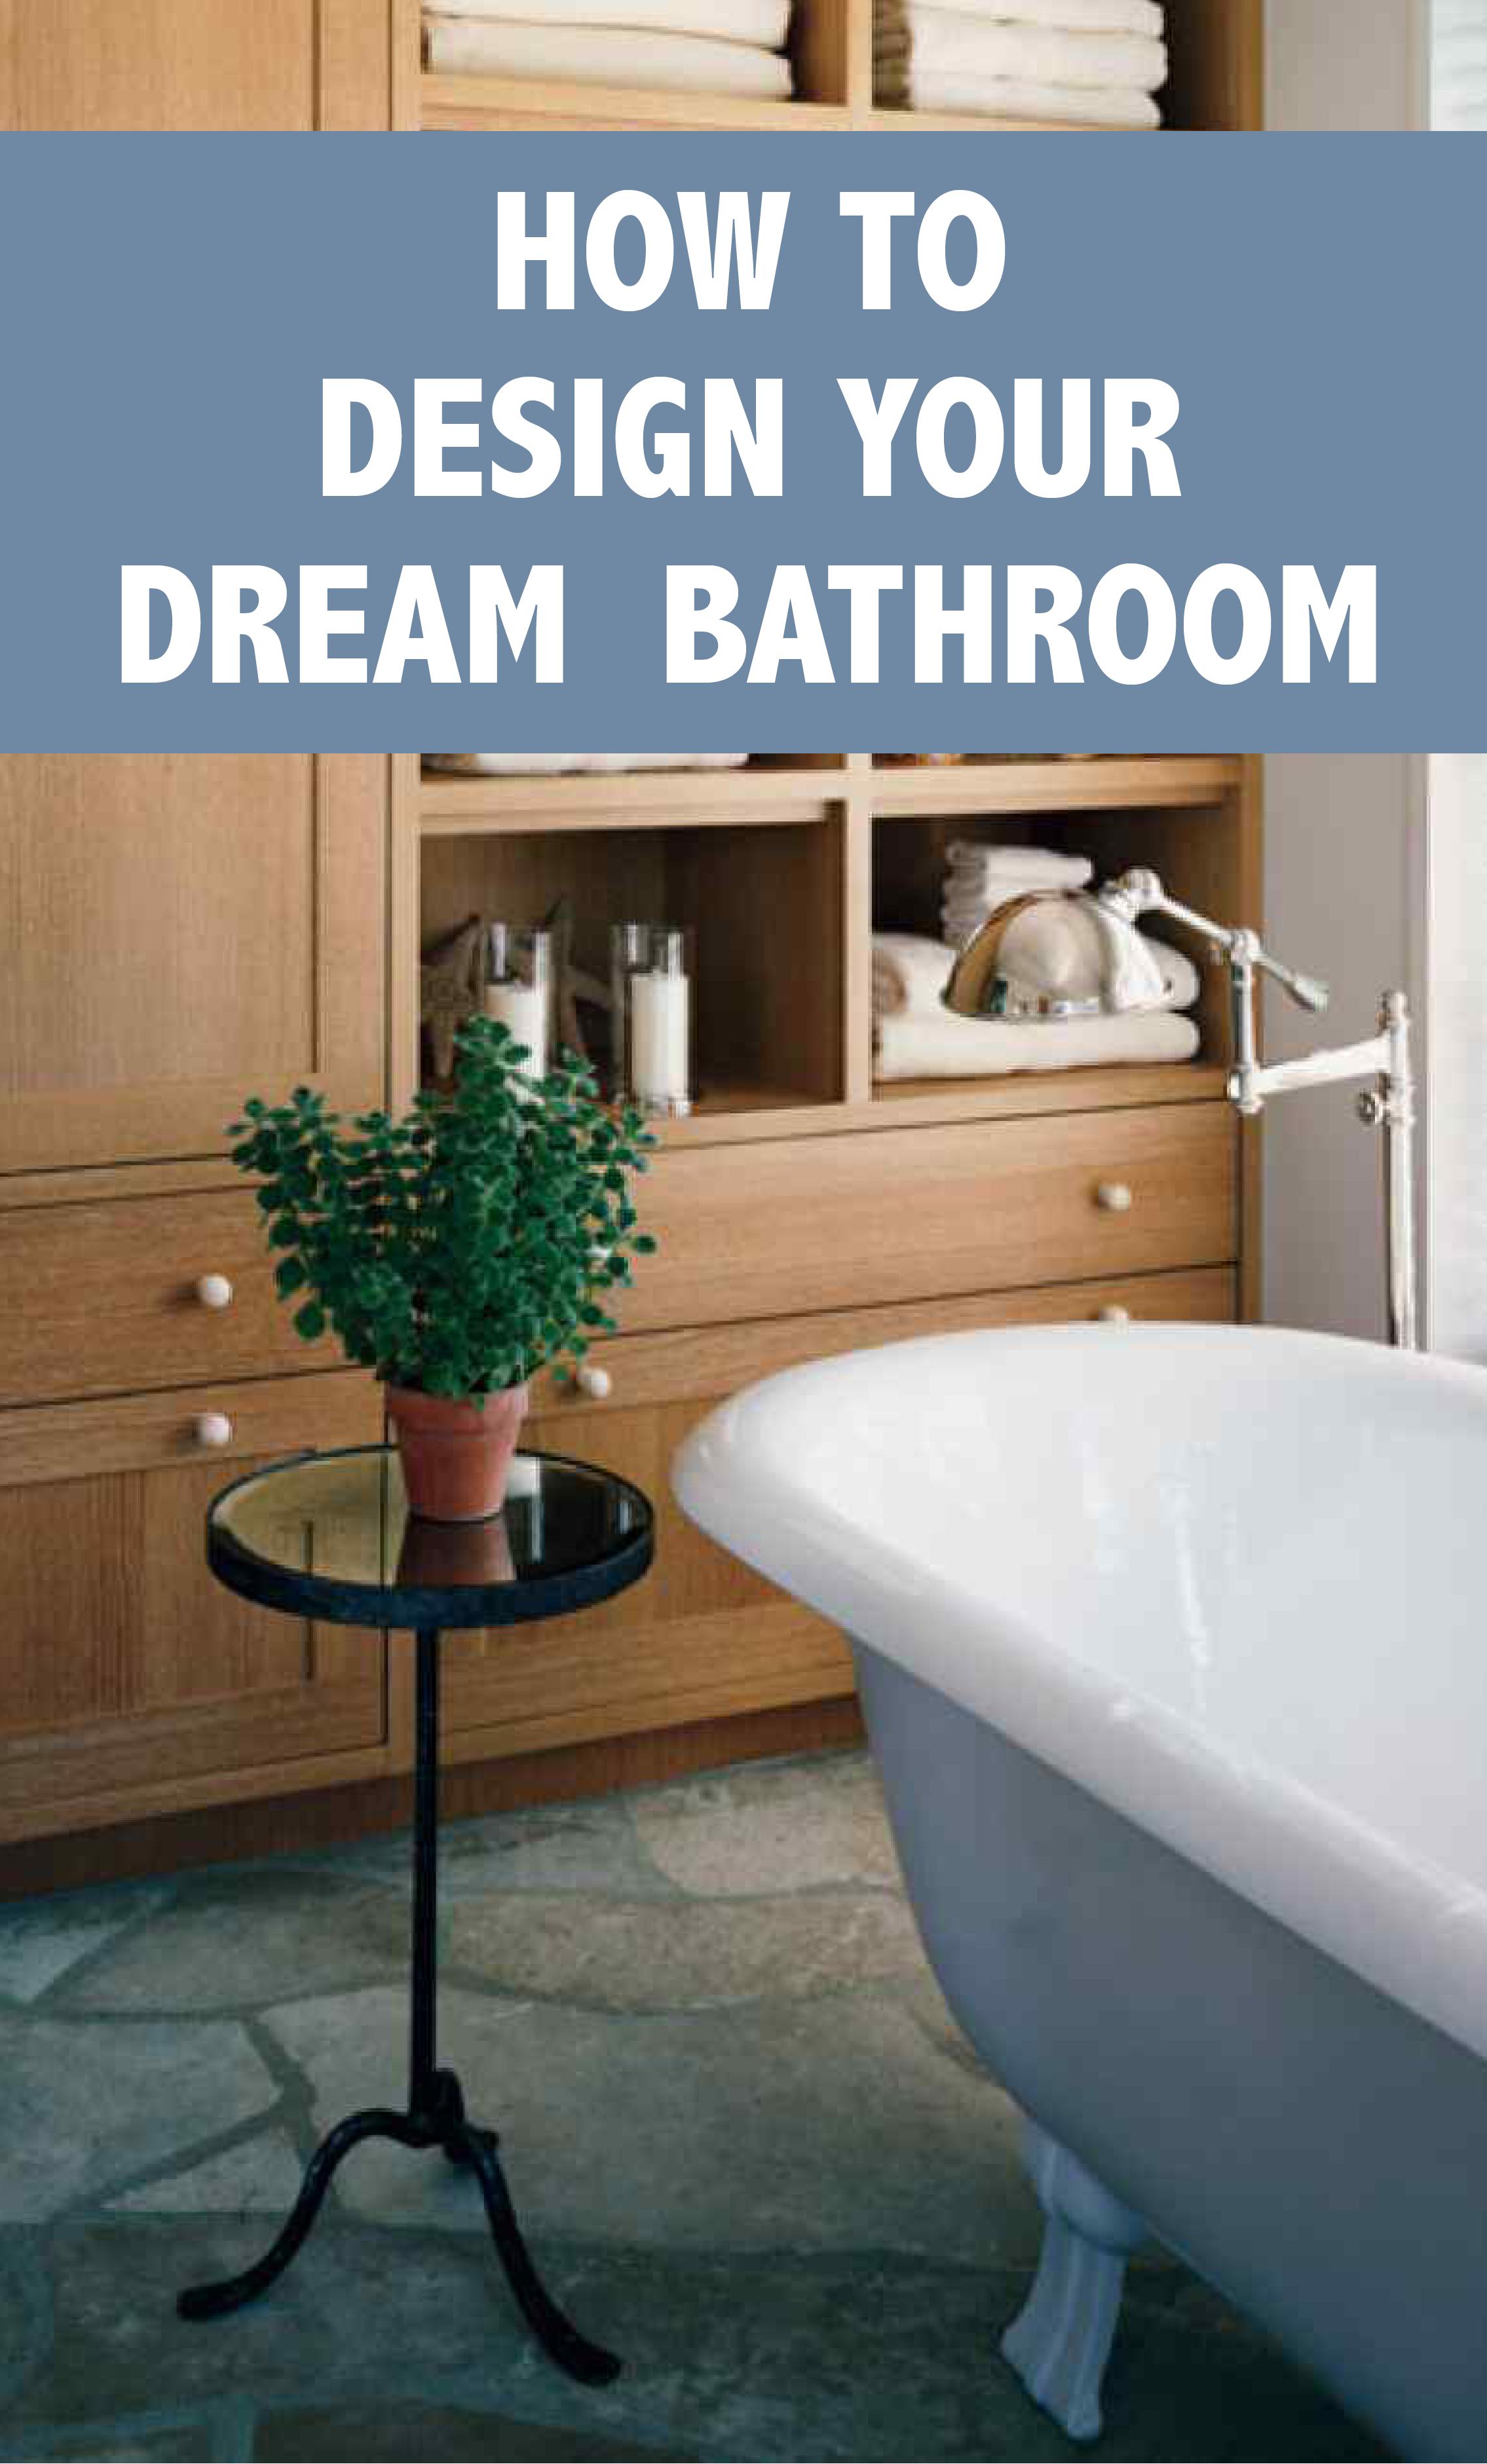 Get an End Table for the Bathtub | Martha Stewart Living - Keep your ...